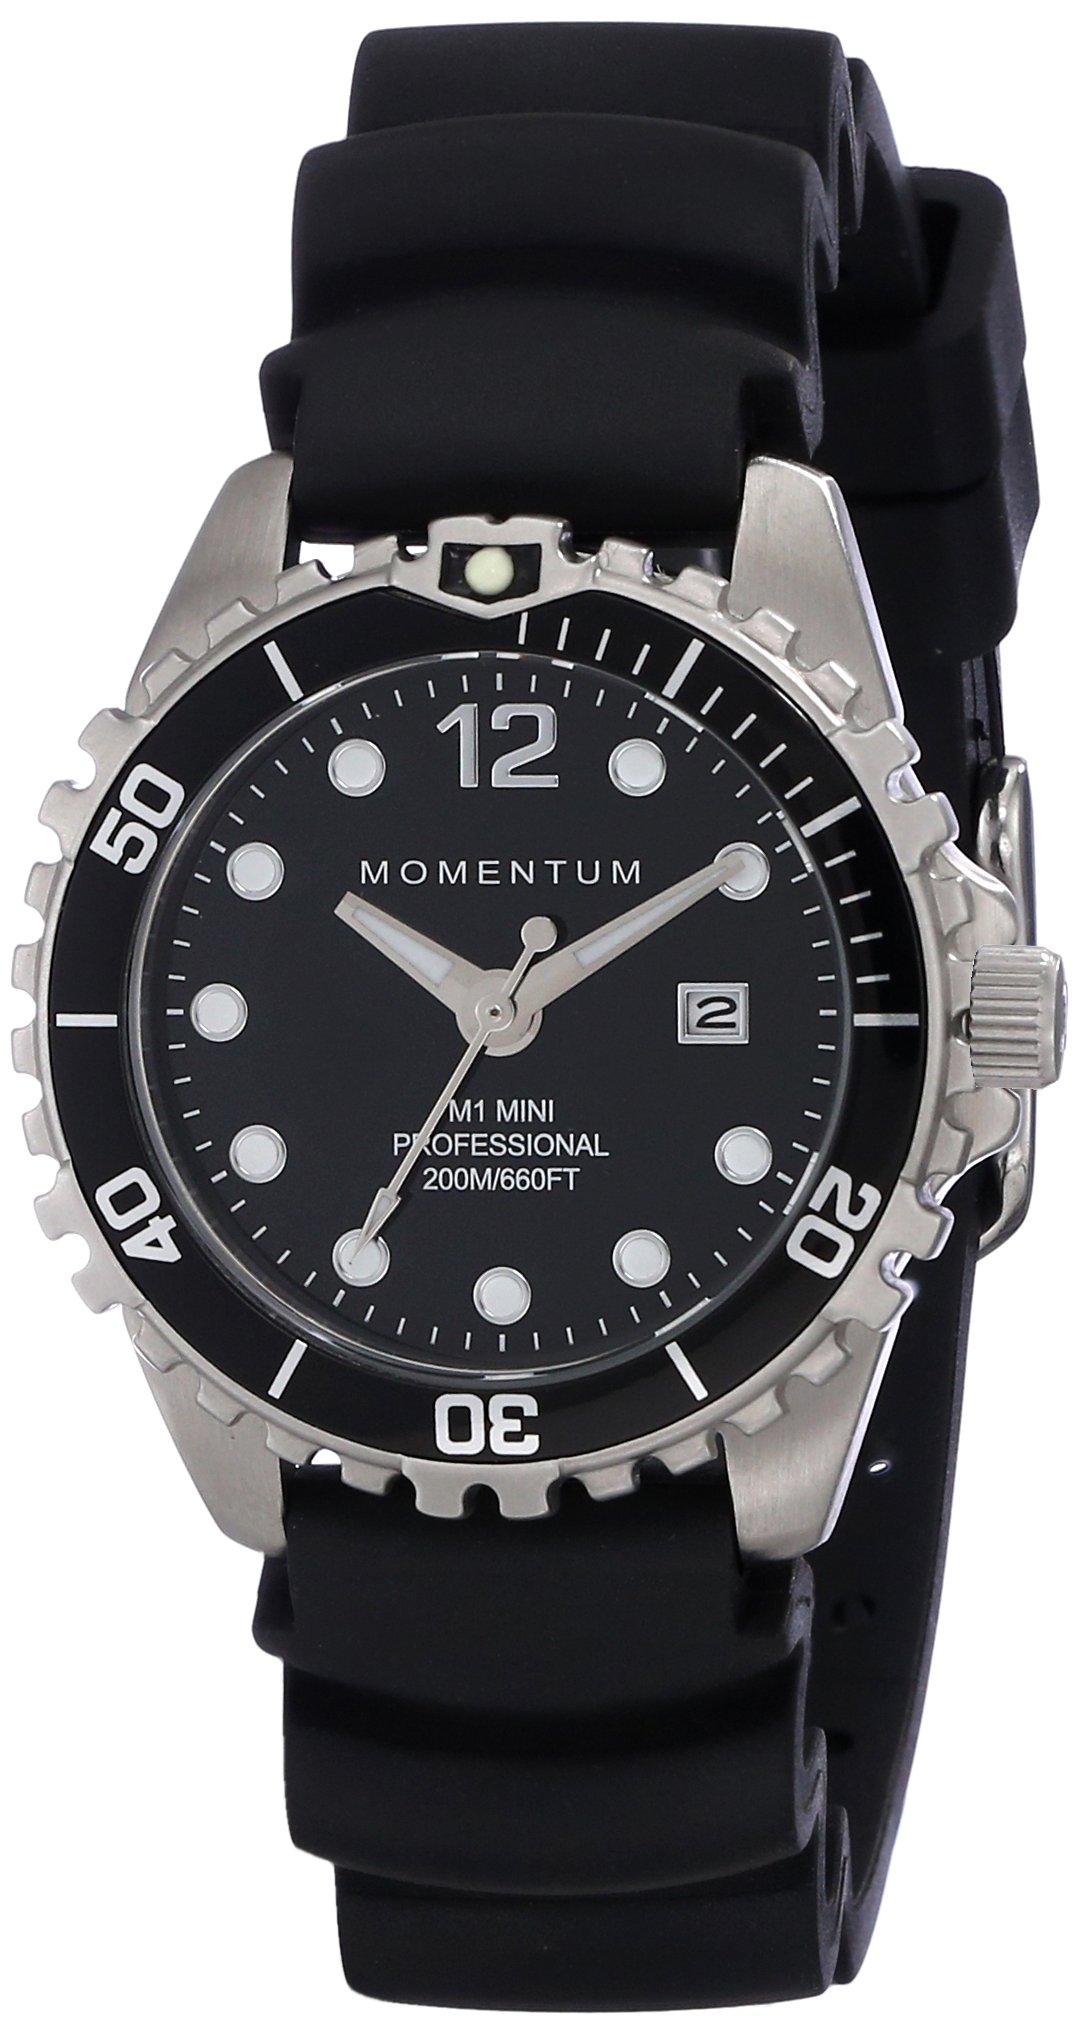 Momentum Women's 1M-DV07BB1B M1 Mini Analog Display Japanese Quartz Black Watch